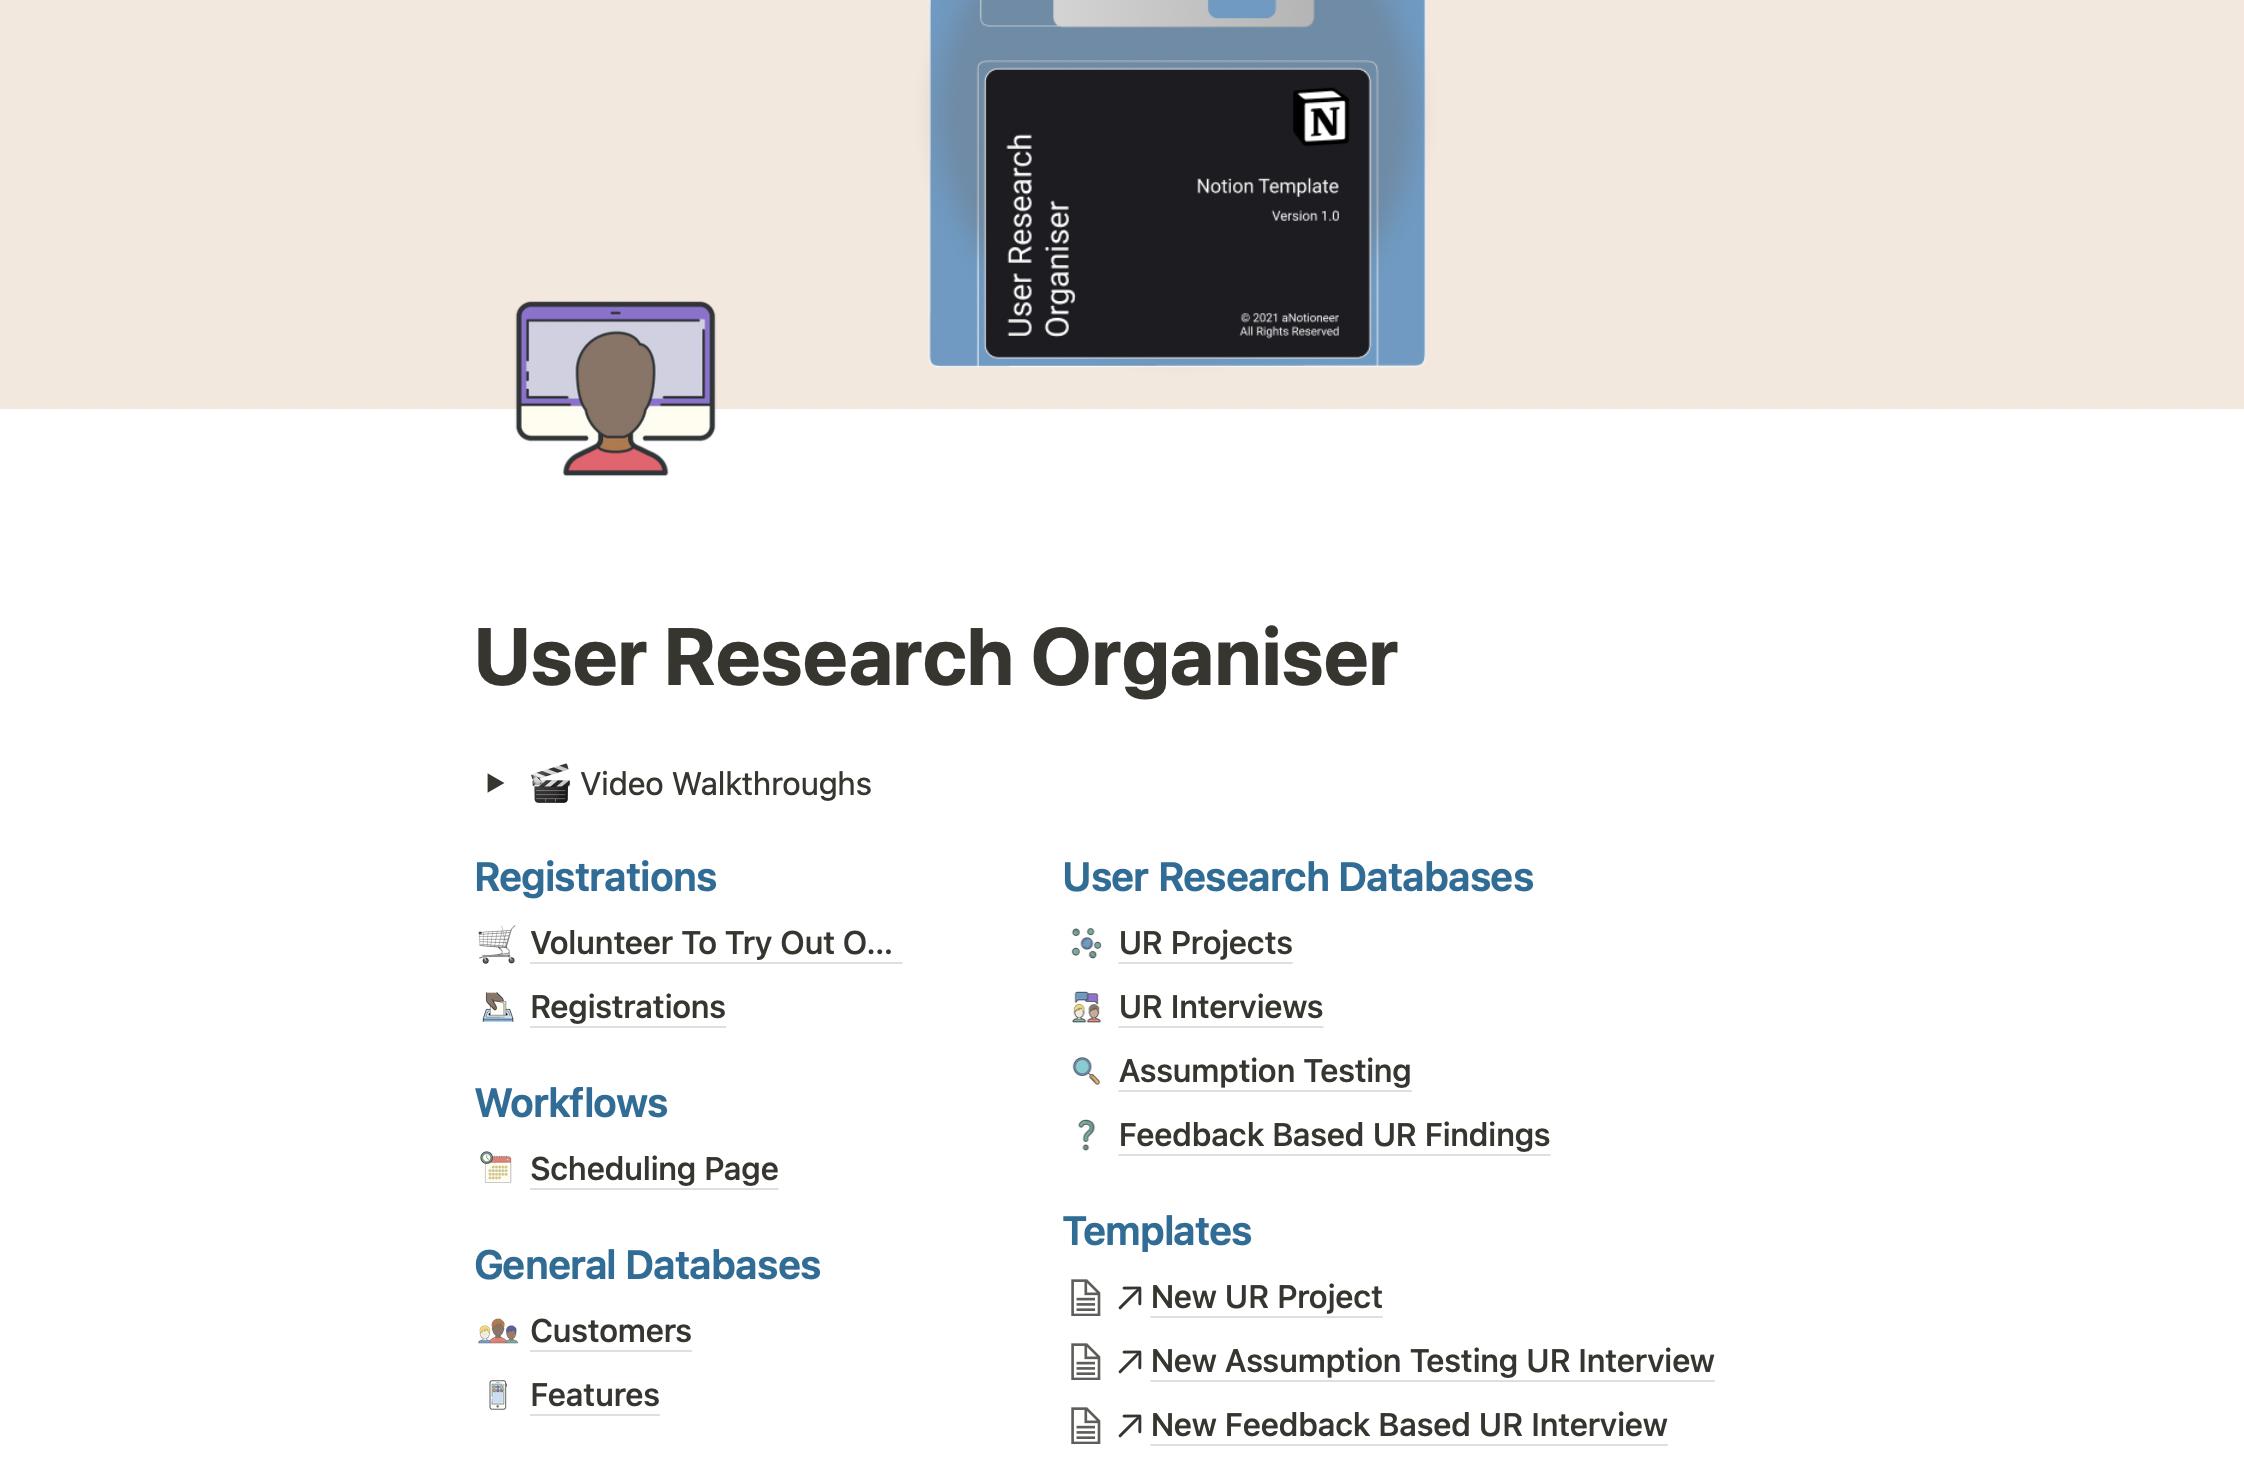 User Research Organiser